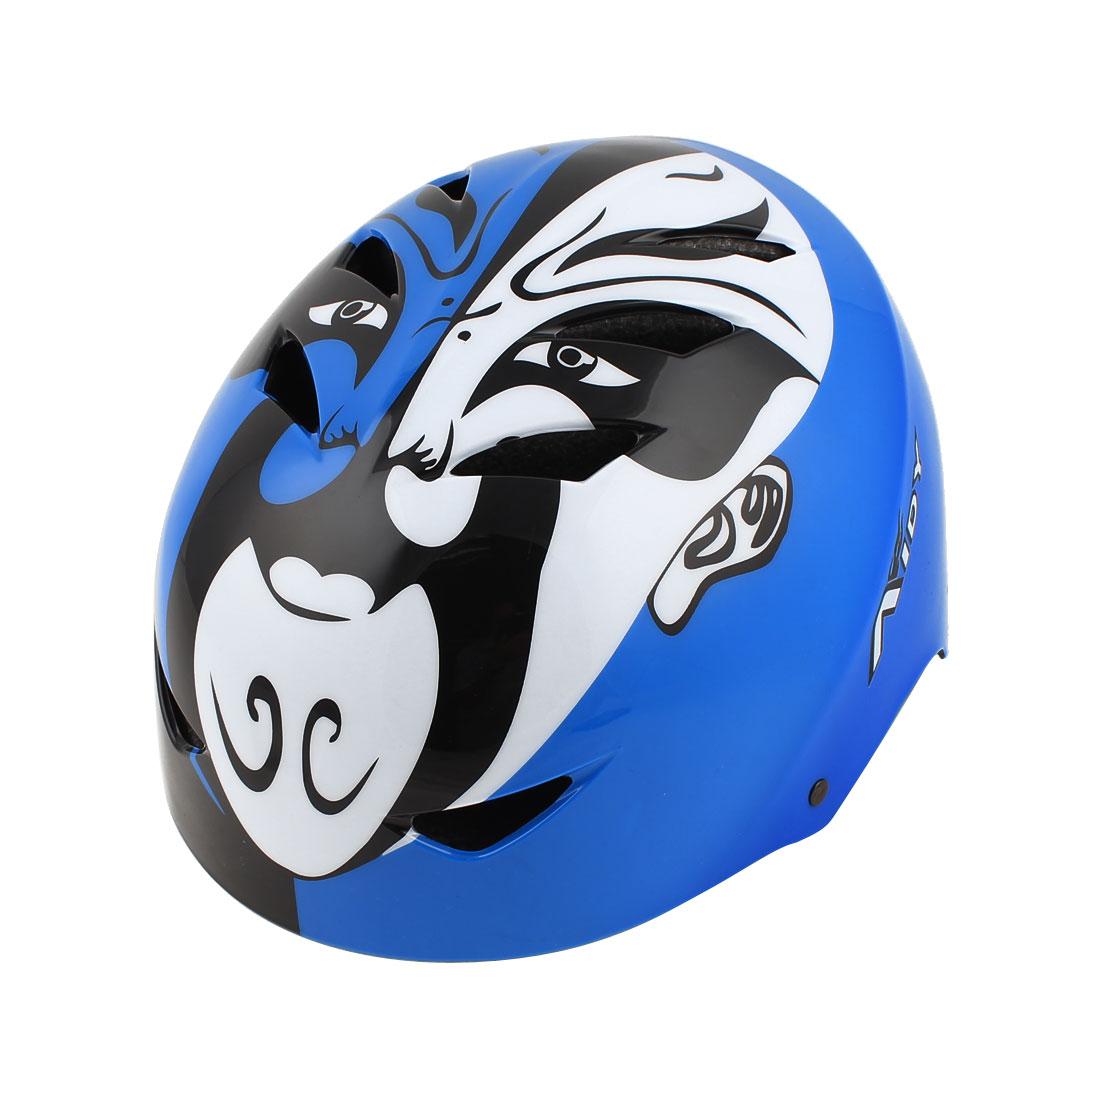 Unisex EPS BMX Bike Bicycle Scooter Roller Skating Ski Racing Helmet Blue